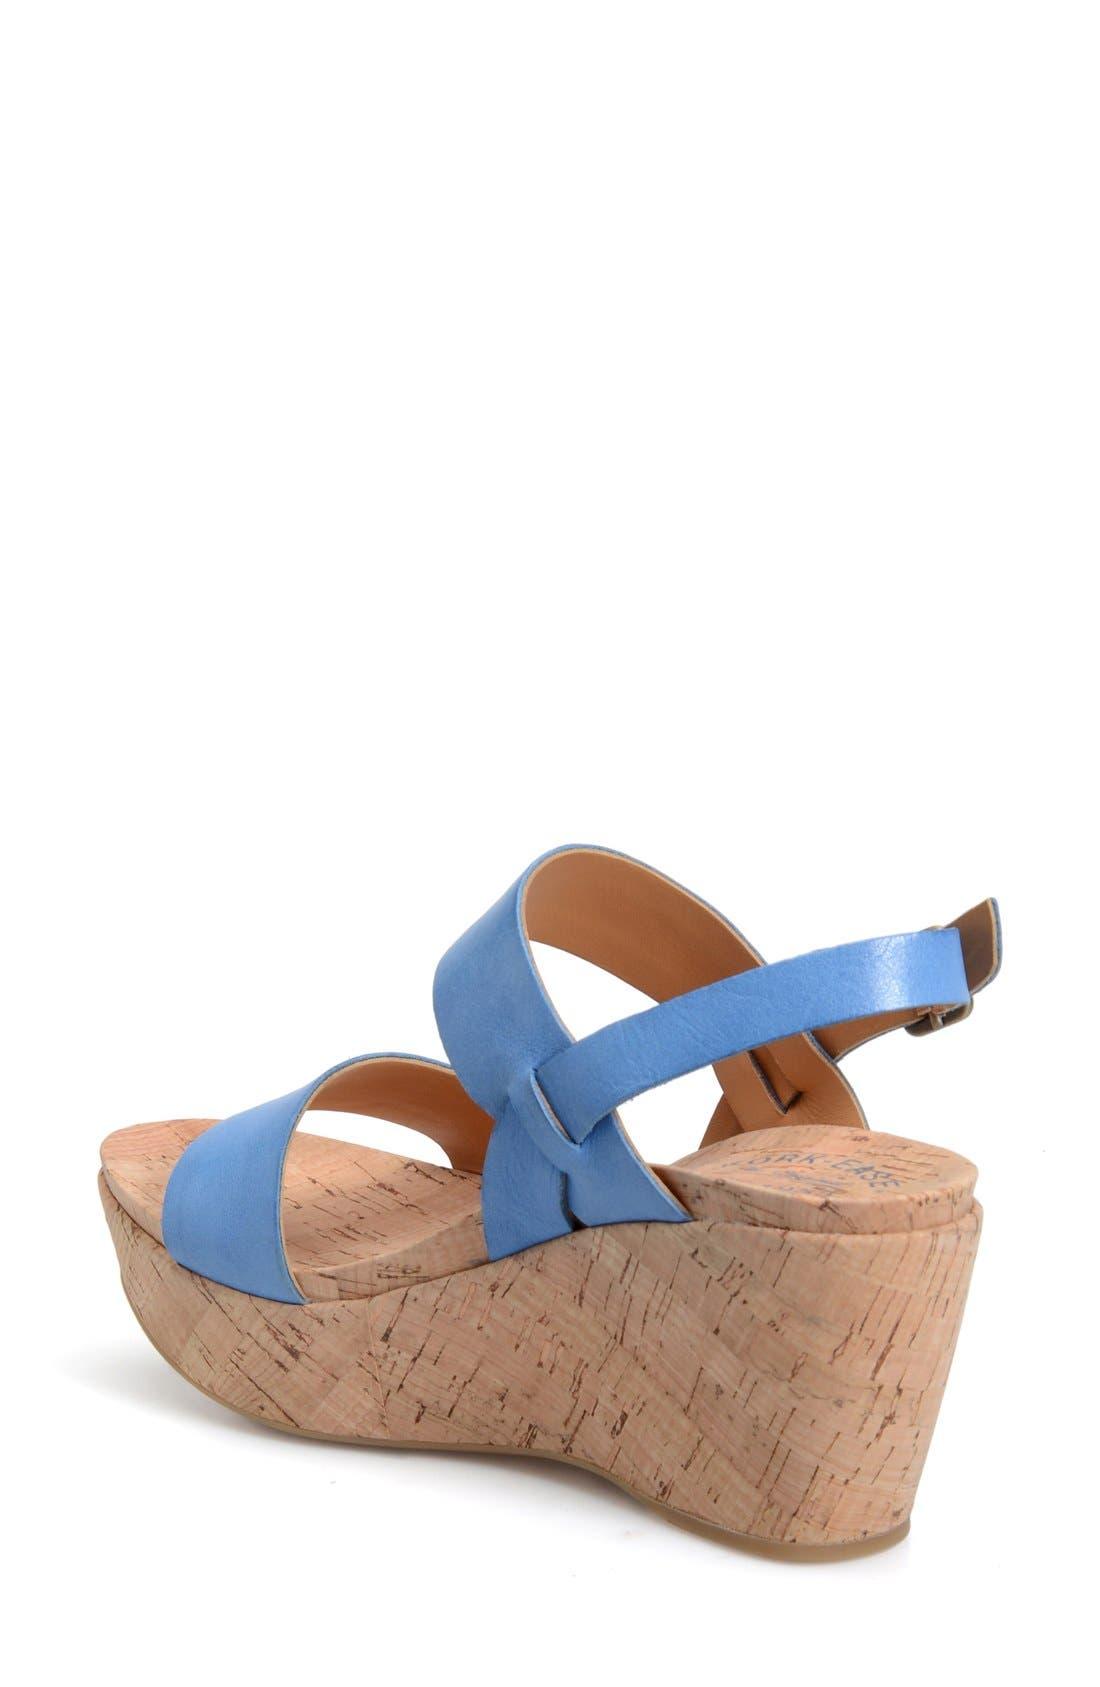 'Austin' Slingback Wedge Sandal,                             Alternate thumbnail 18, color,